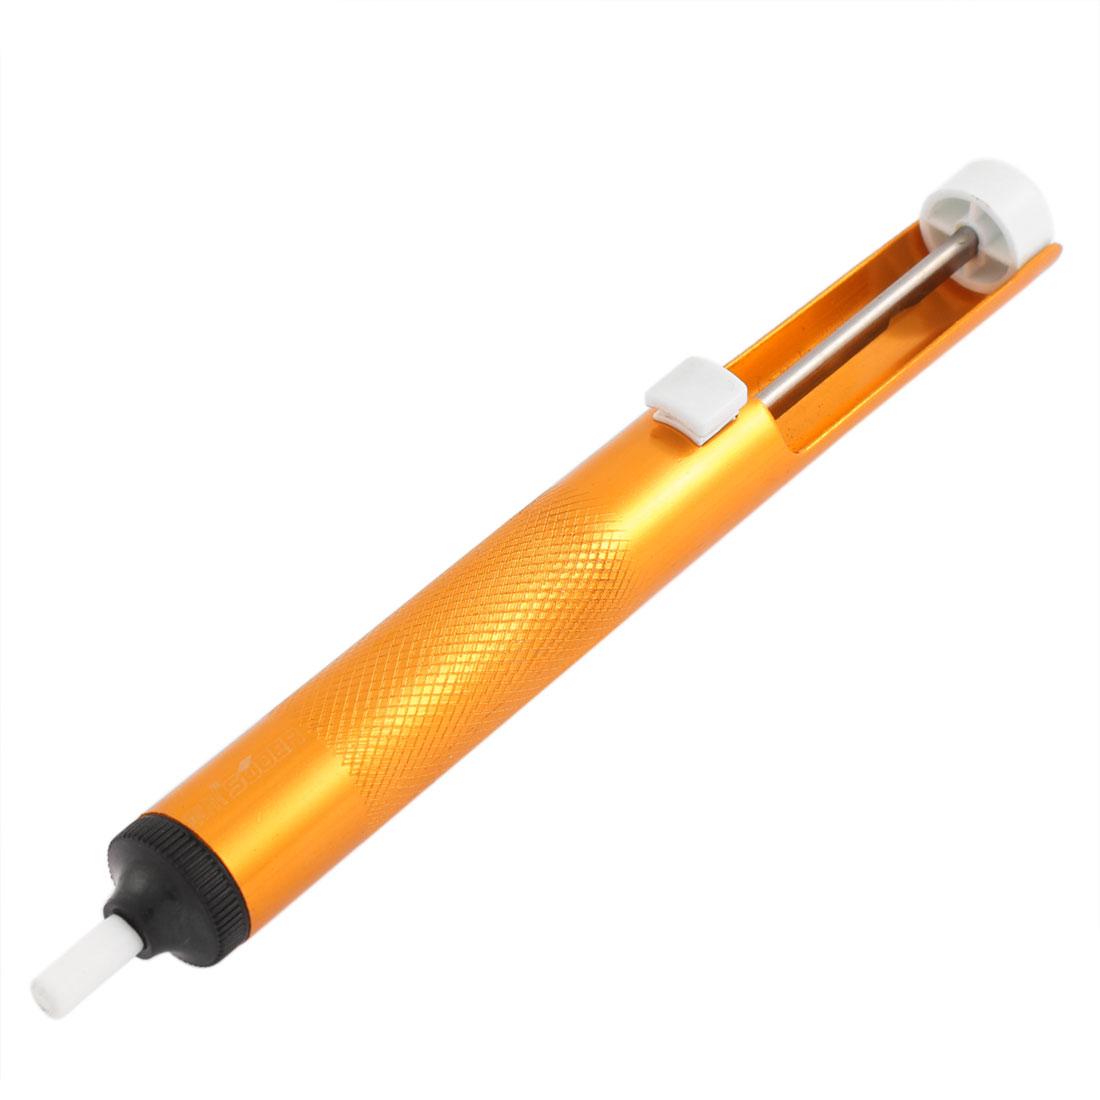 Solder Sucker Desoldering Pump Removal Vacuum Soldering Tool Gold Tone